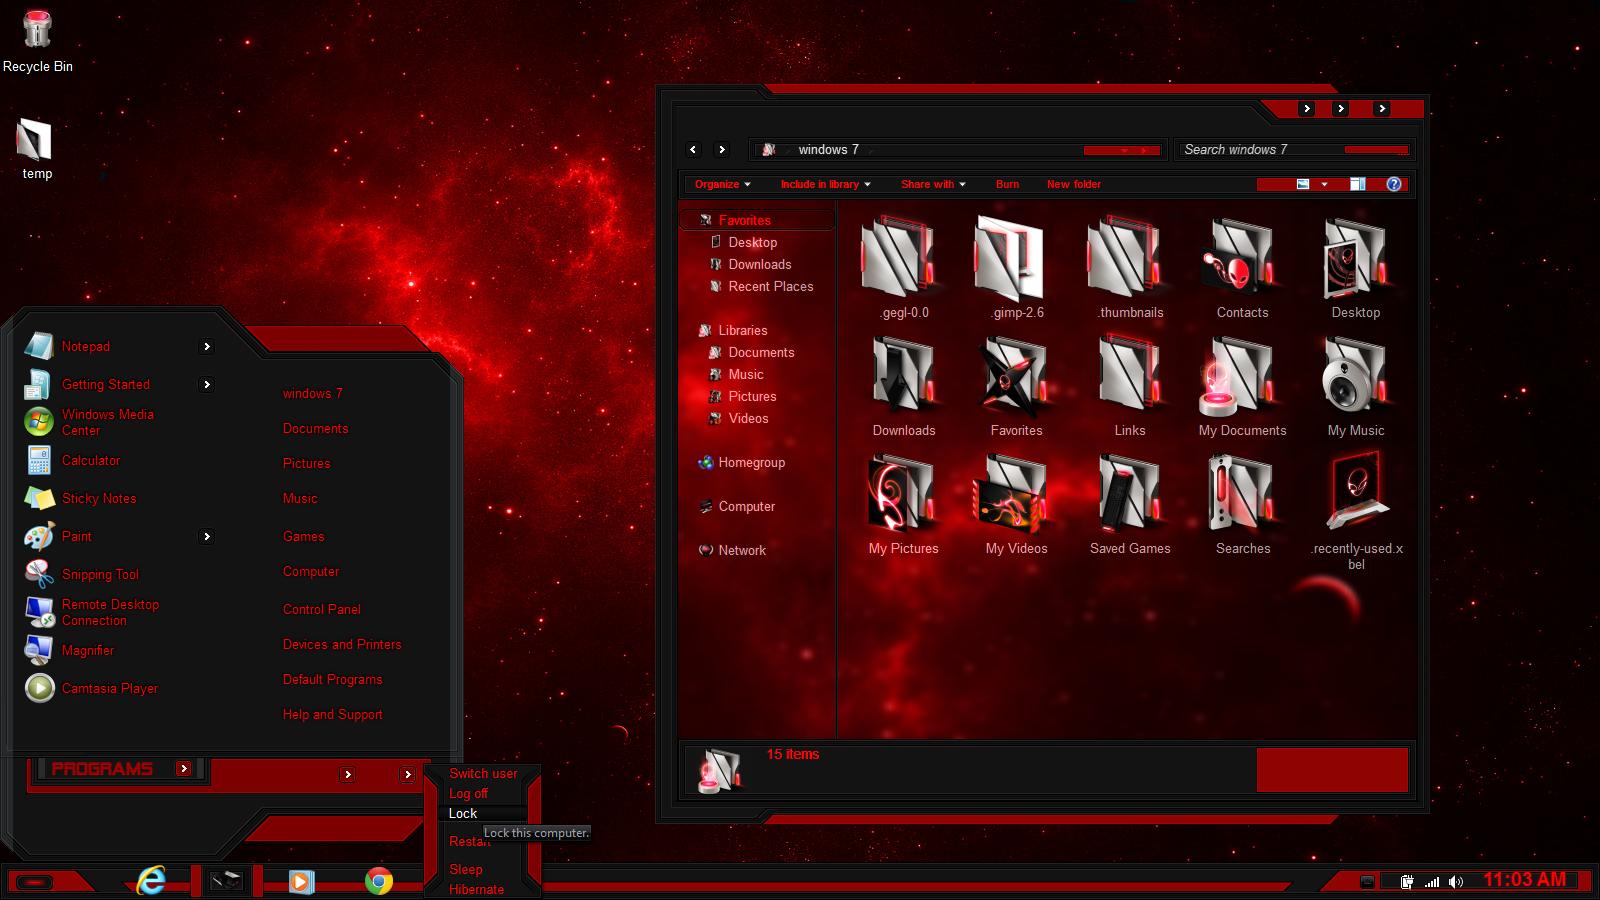 Red And Black Windows 7 Themes Windows 7 theme...